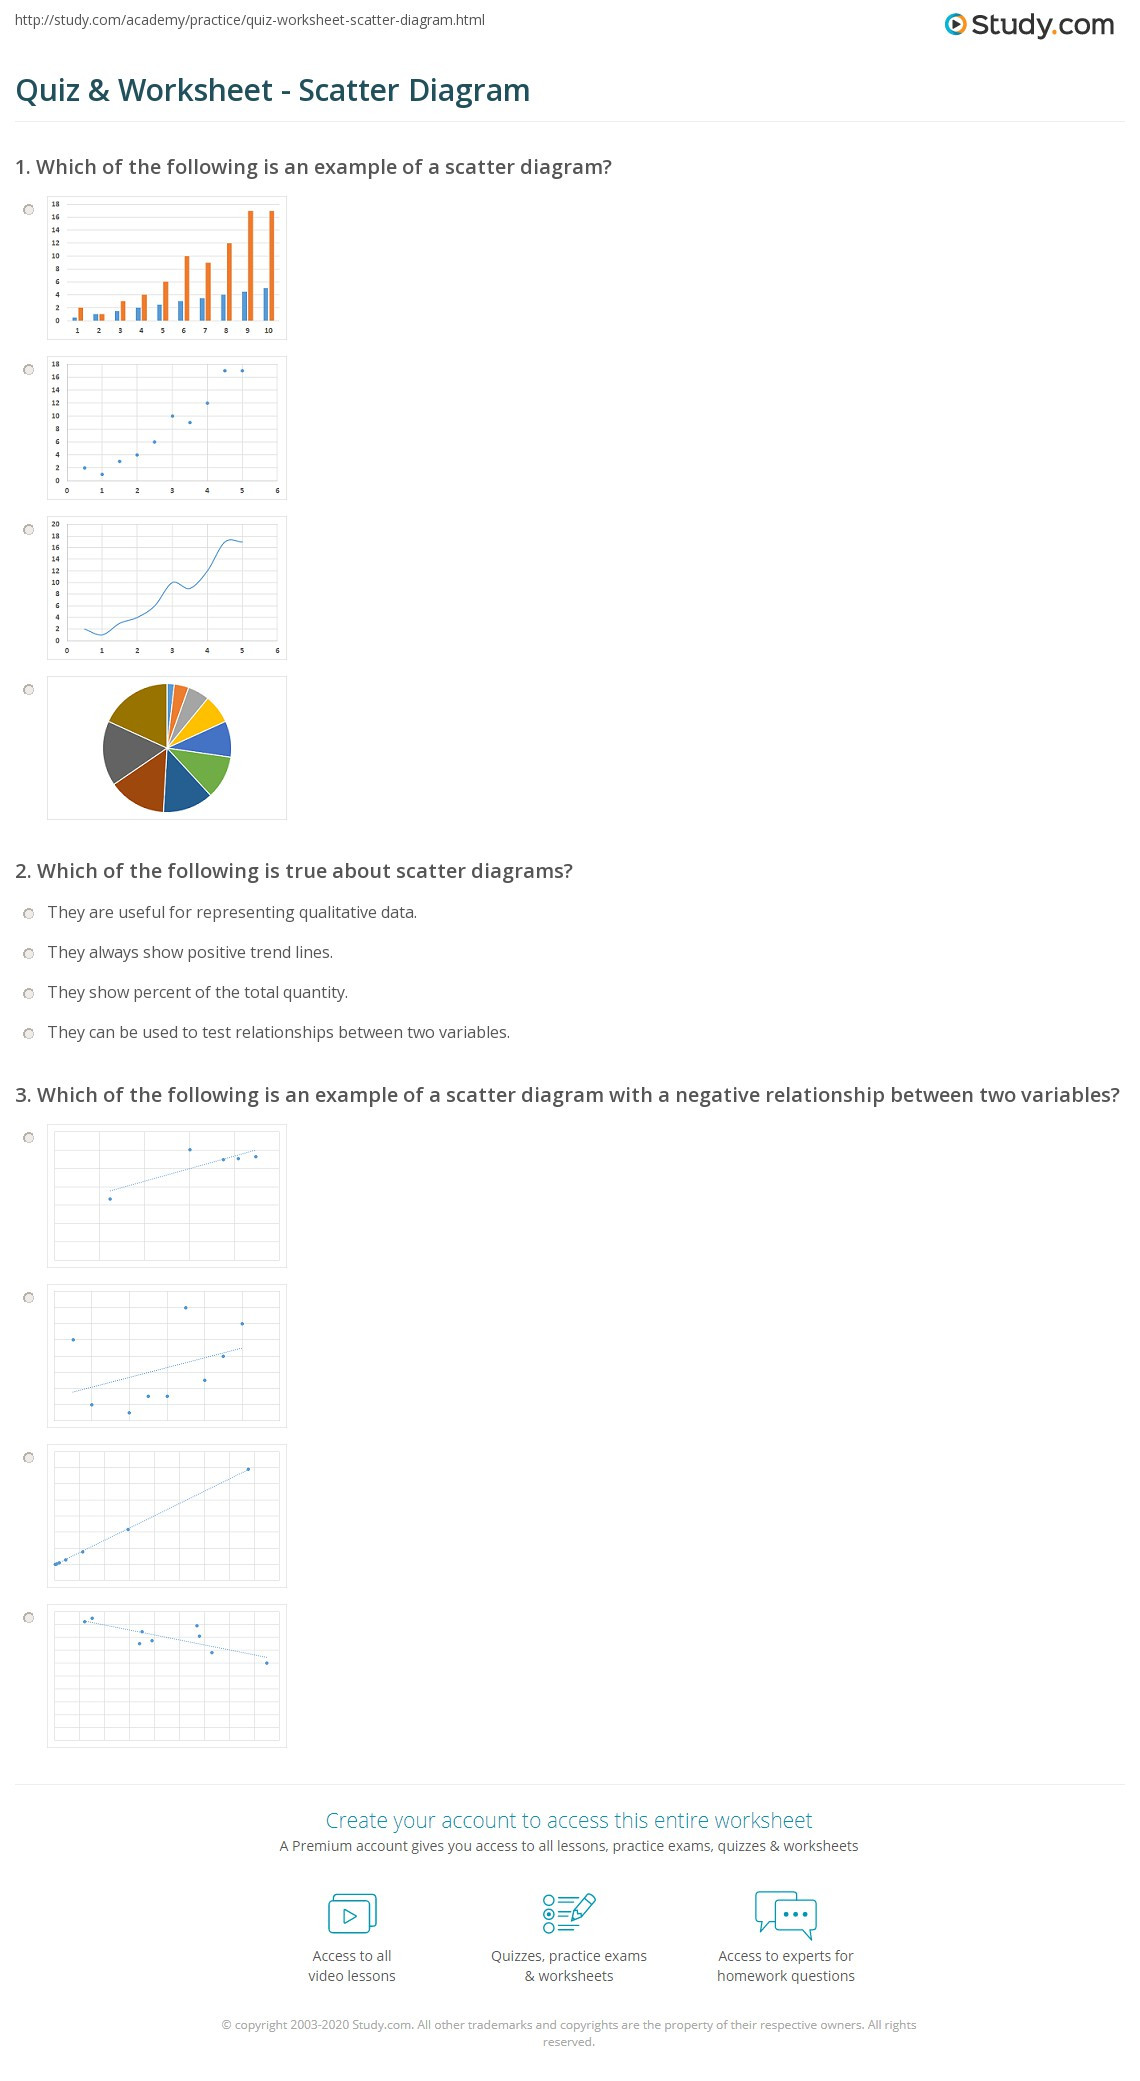 Correlation Vs Causation Worksheet Quiz & Worksheet Scatter Diagram